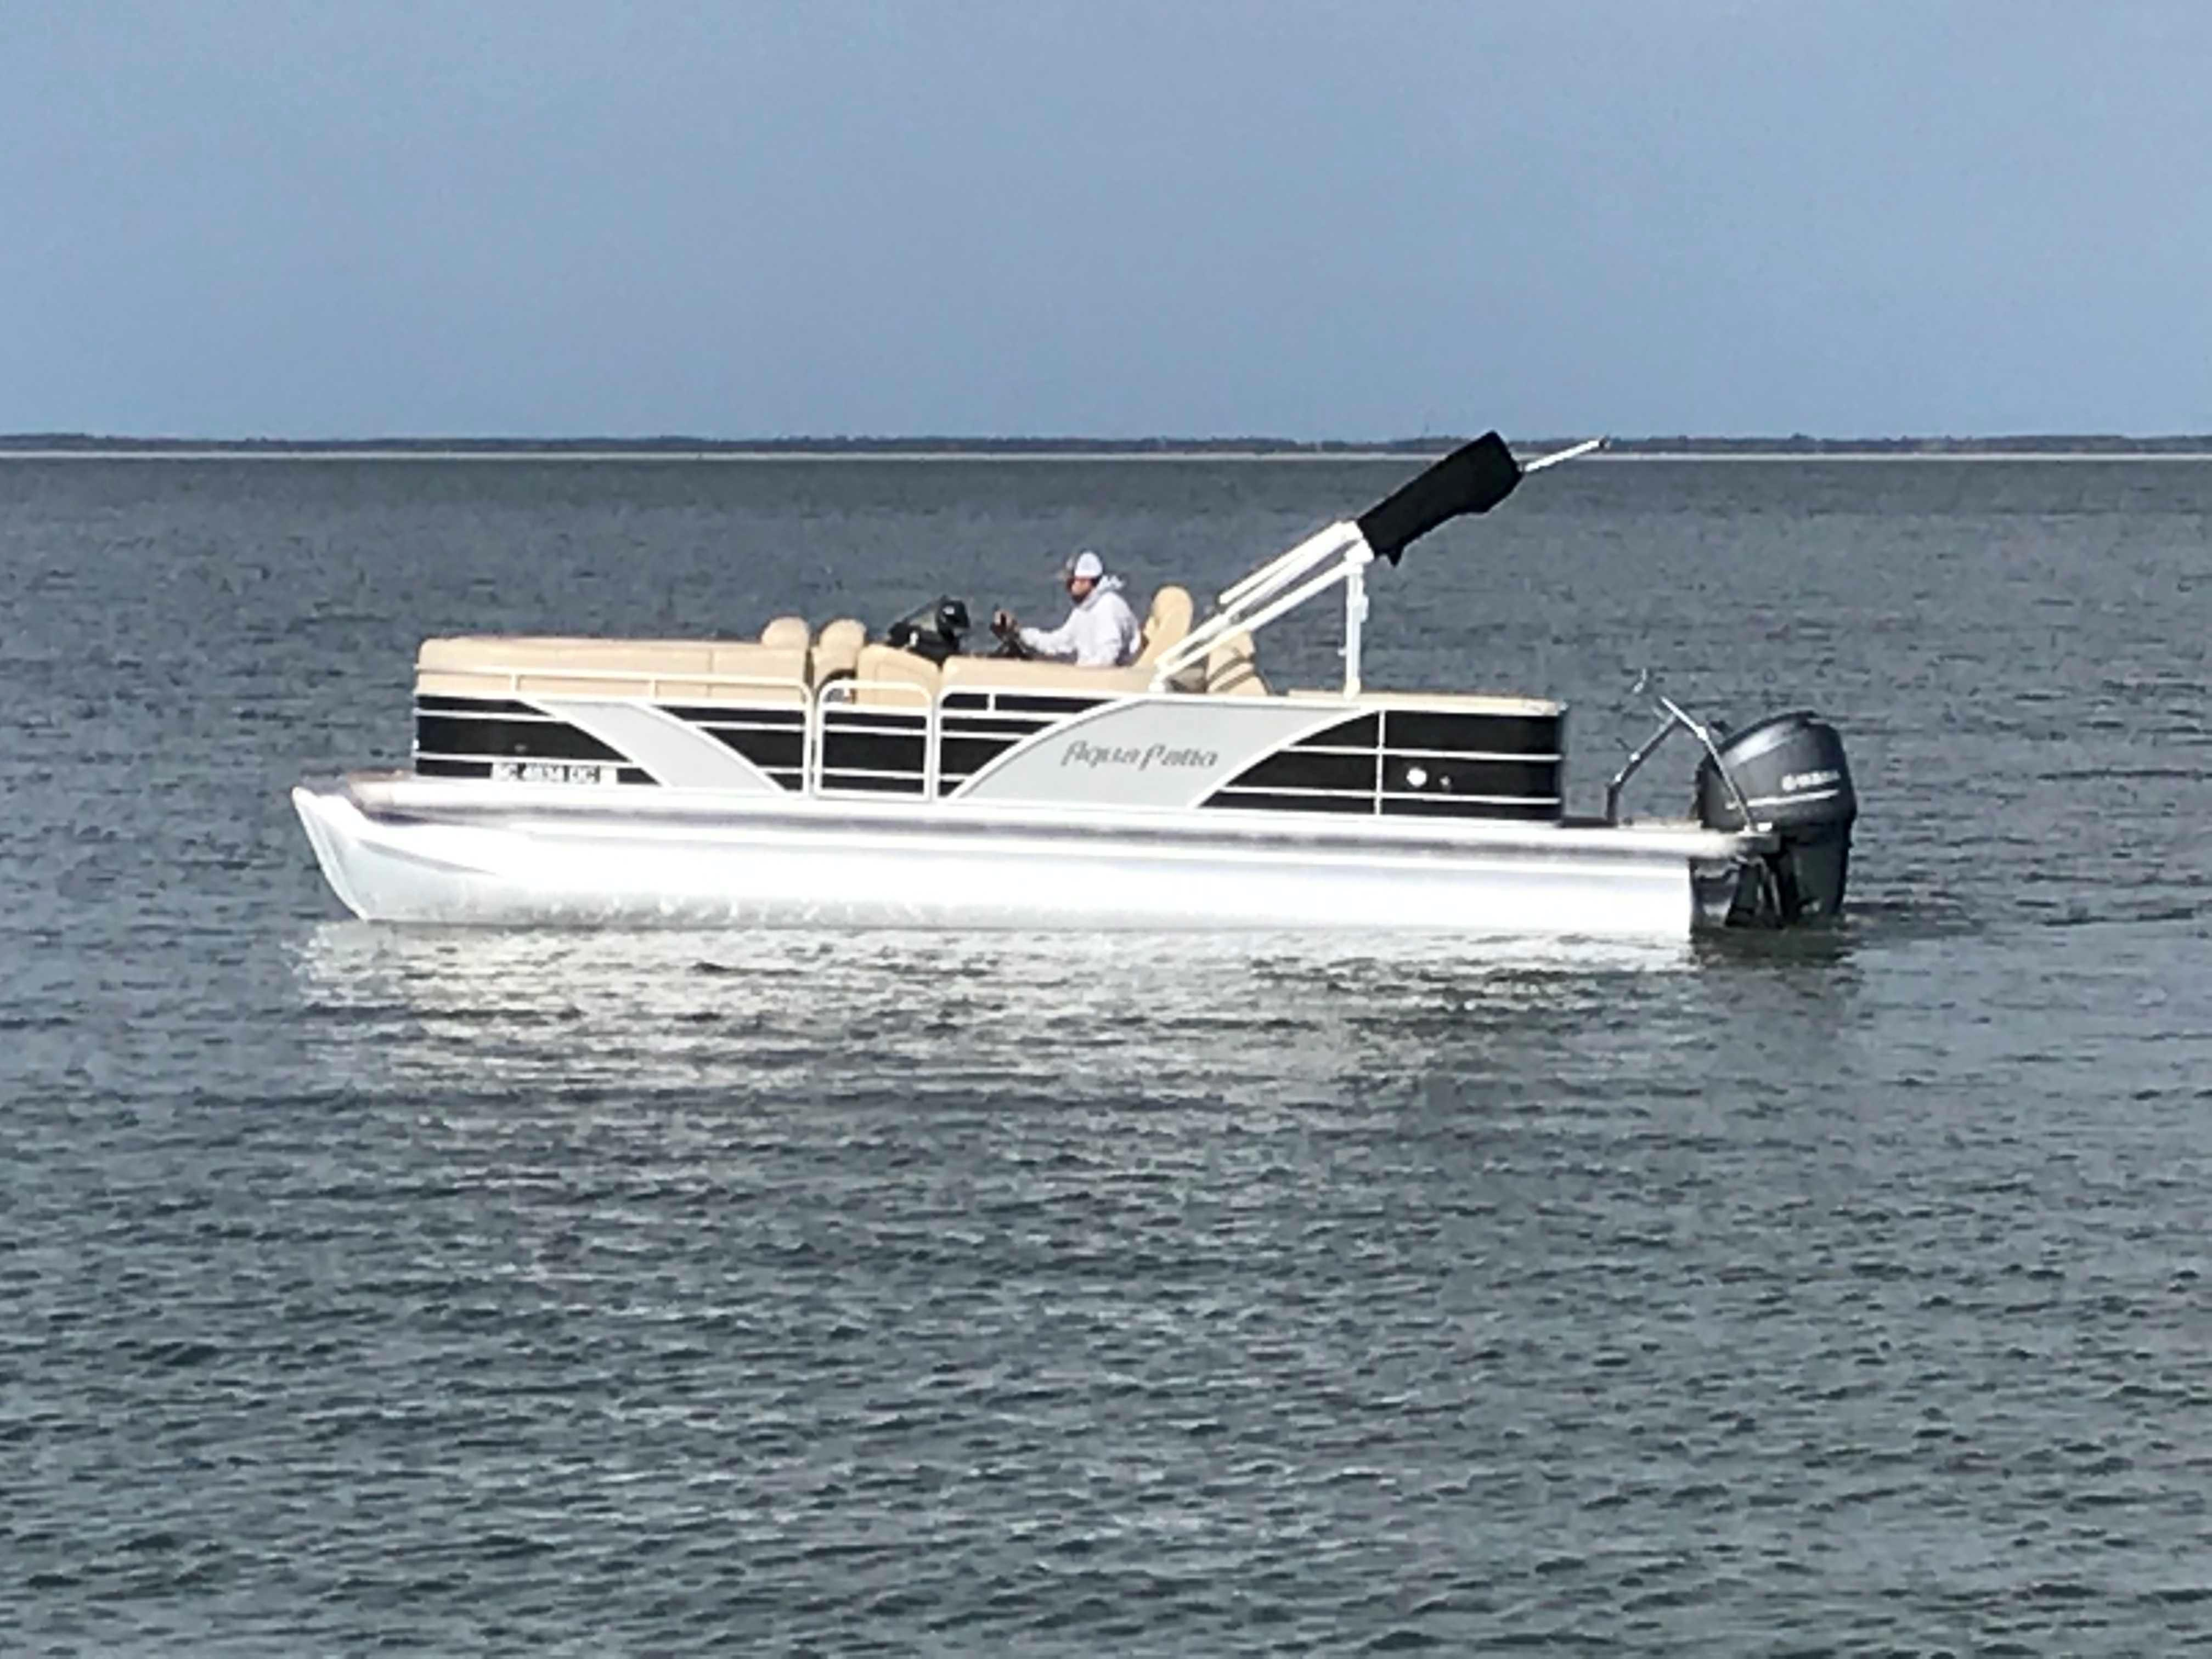 Godfrey Aqua Patio - Port side afloat